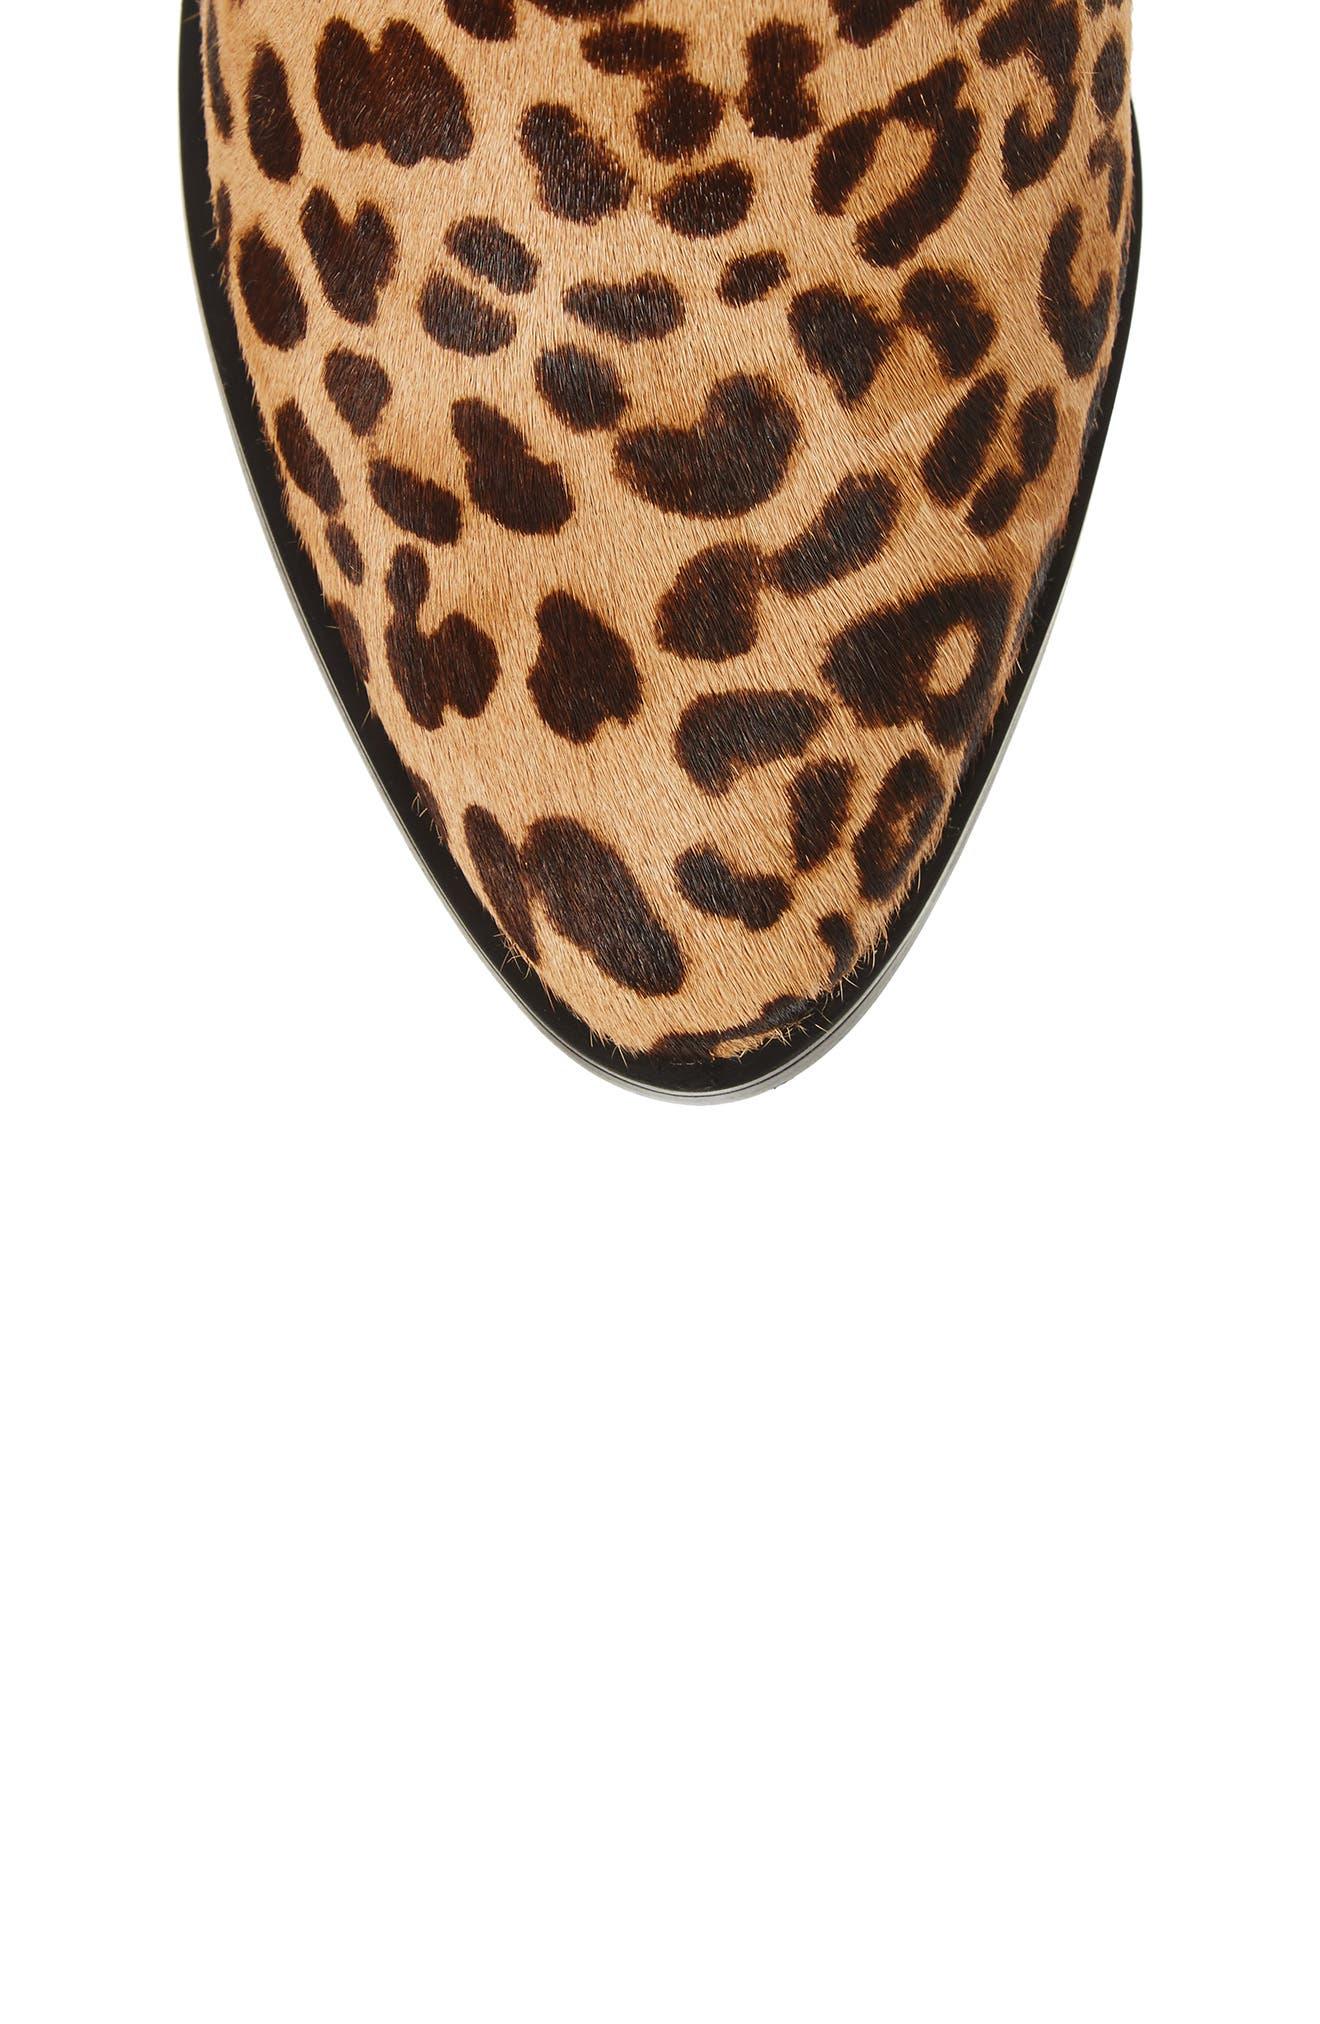 Rewind-L Genuine Calf Hair Bootie,                             Alternate thumbnail 5, color,                             Leopard